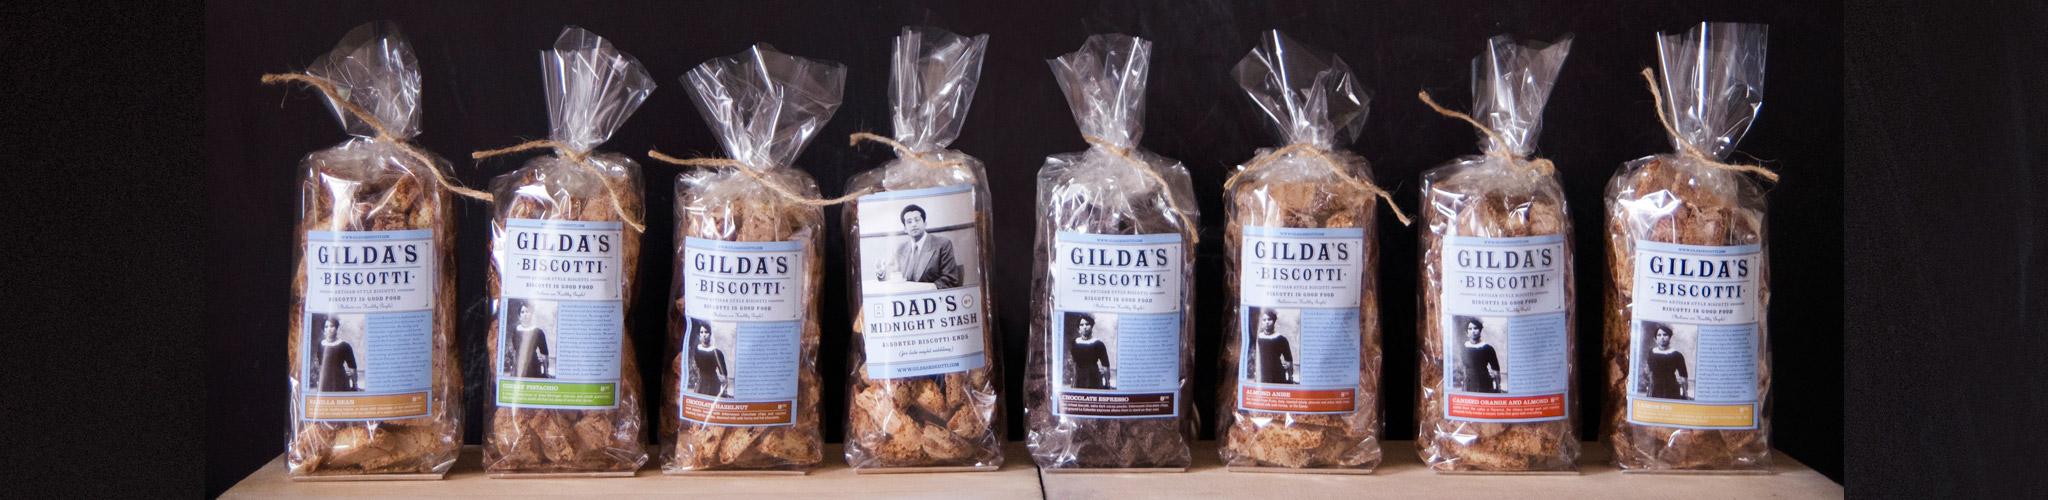 Gilda's Biscotti flavor lineup